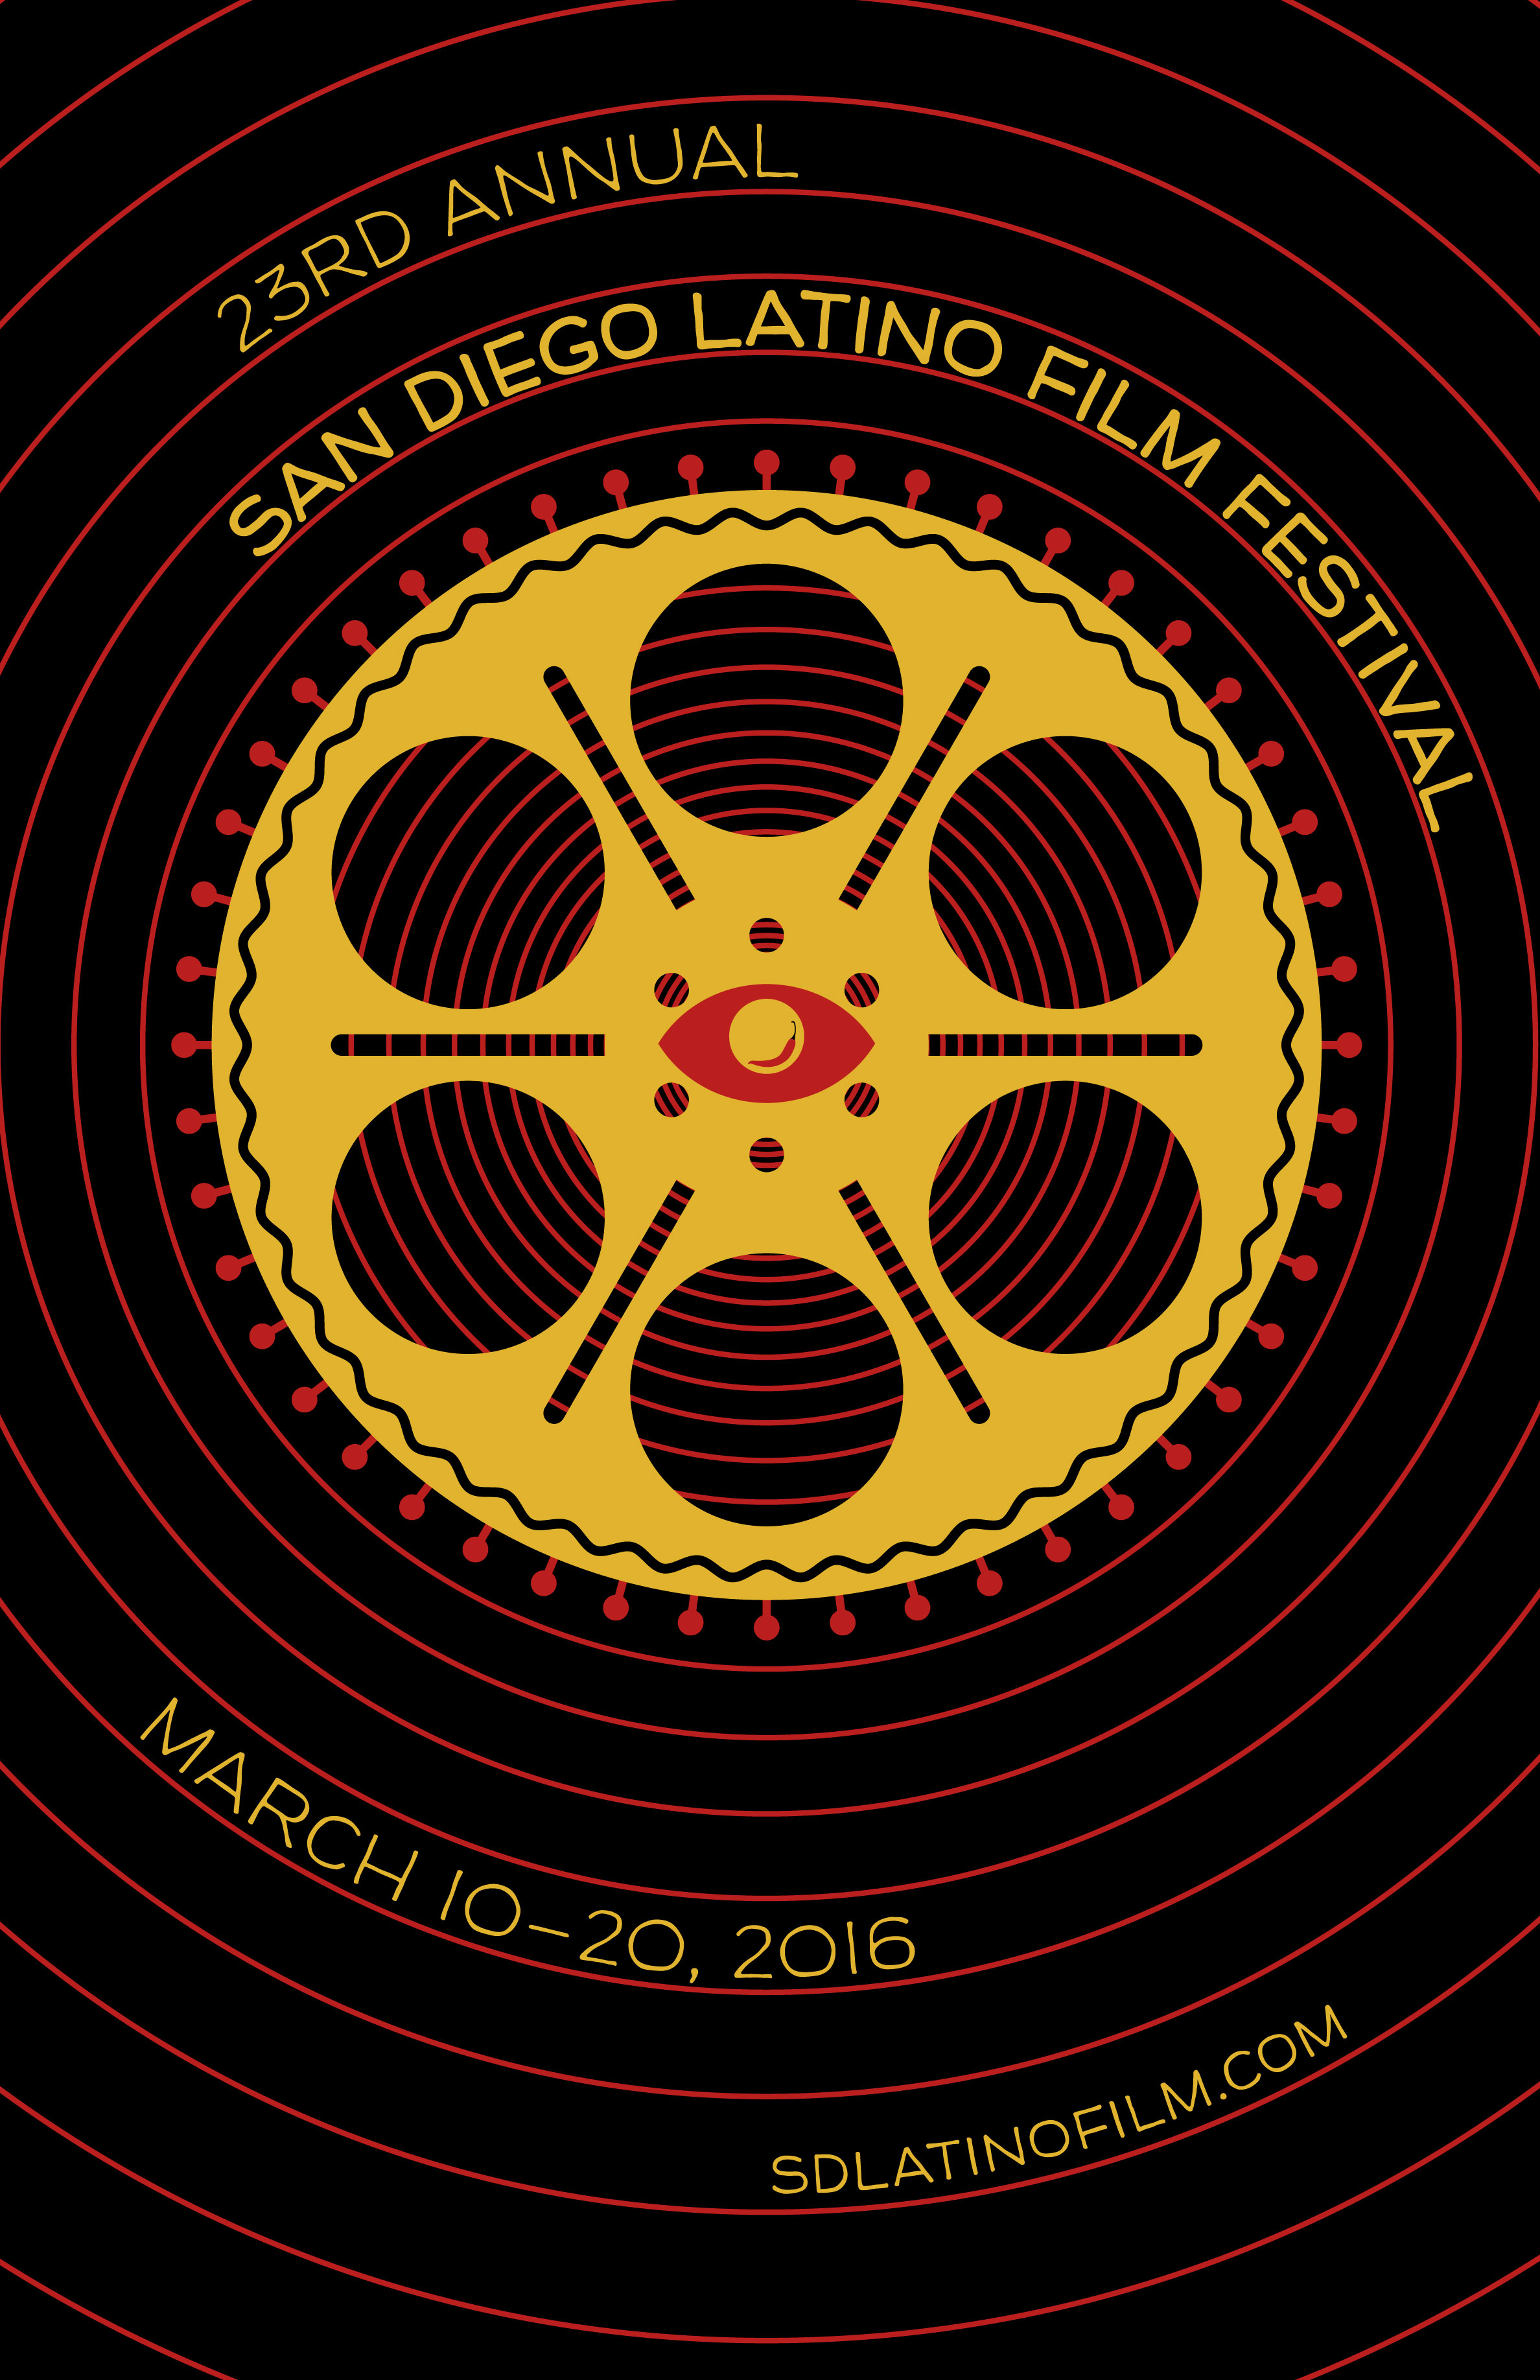 Kolja van Boekel Latino Film Festival Hypnotic_Circle